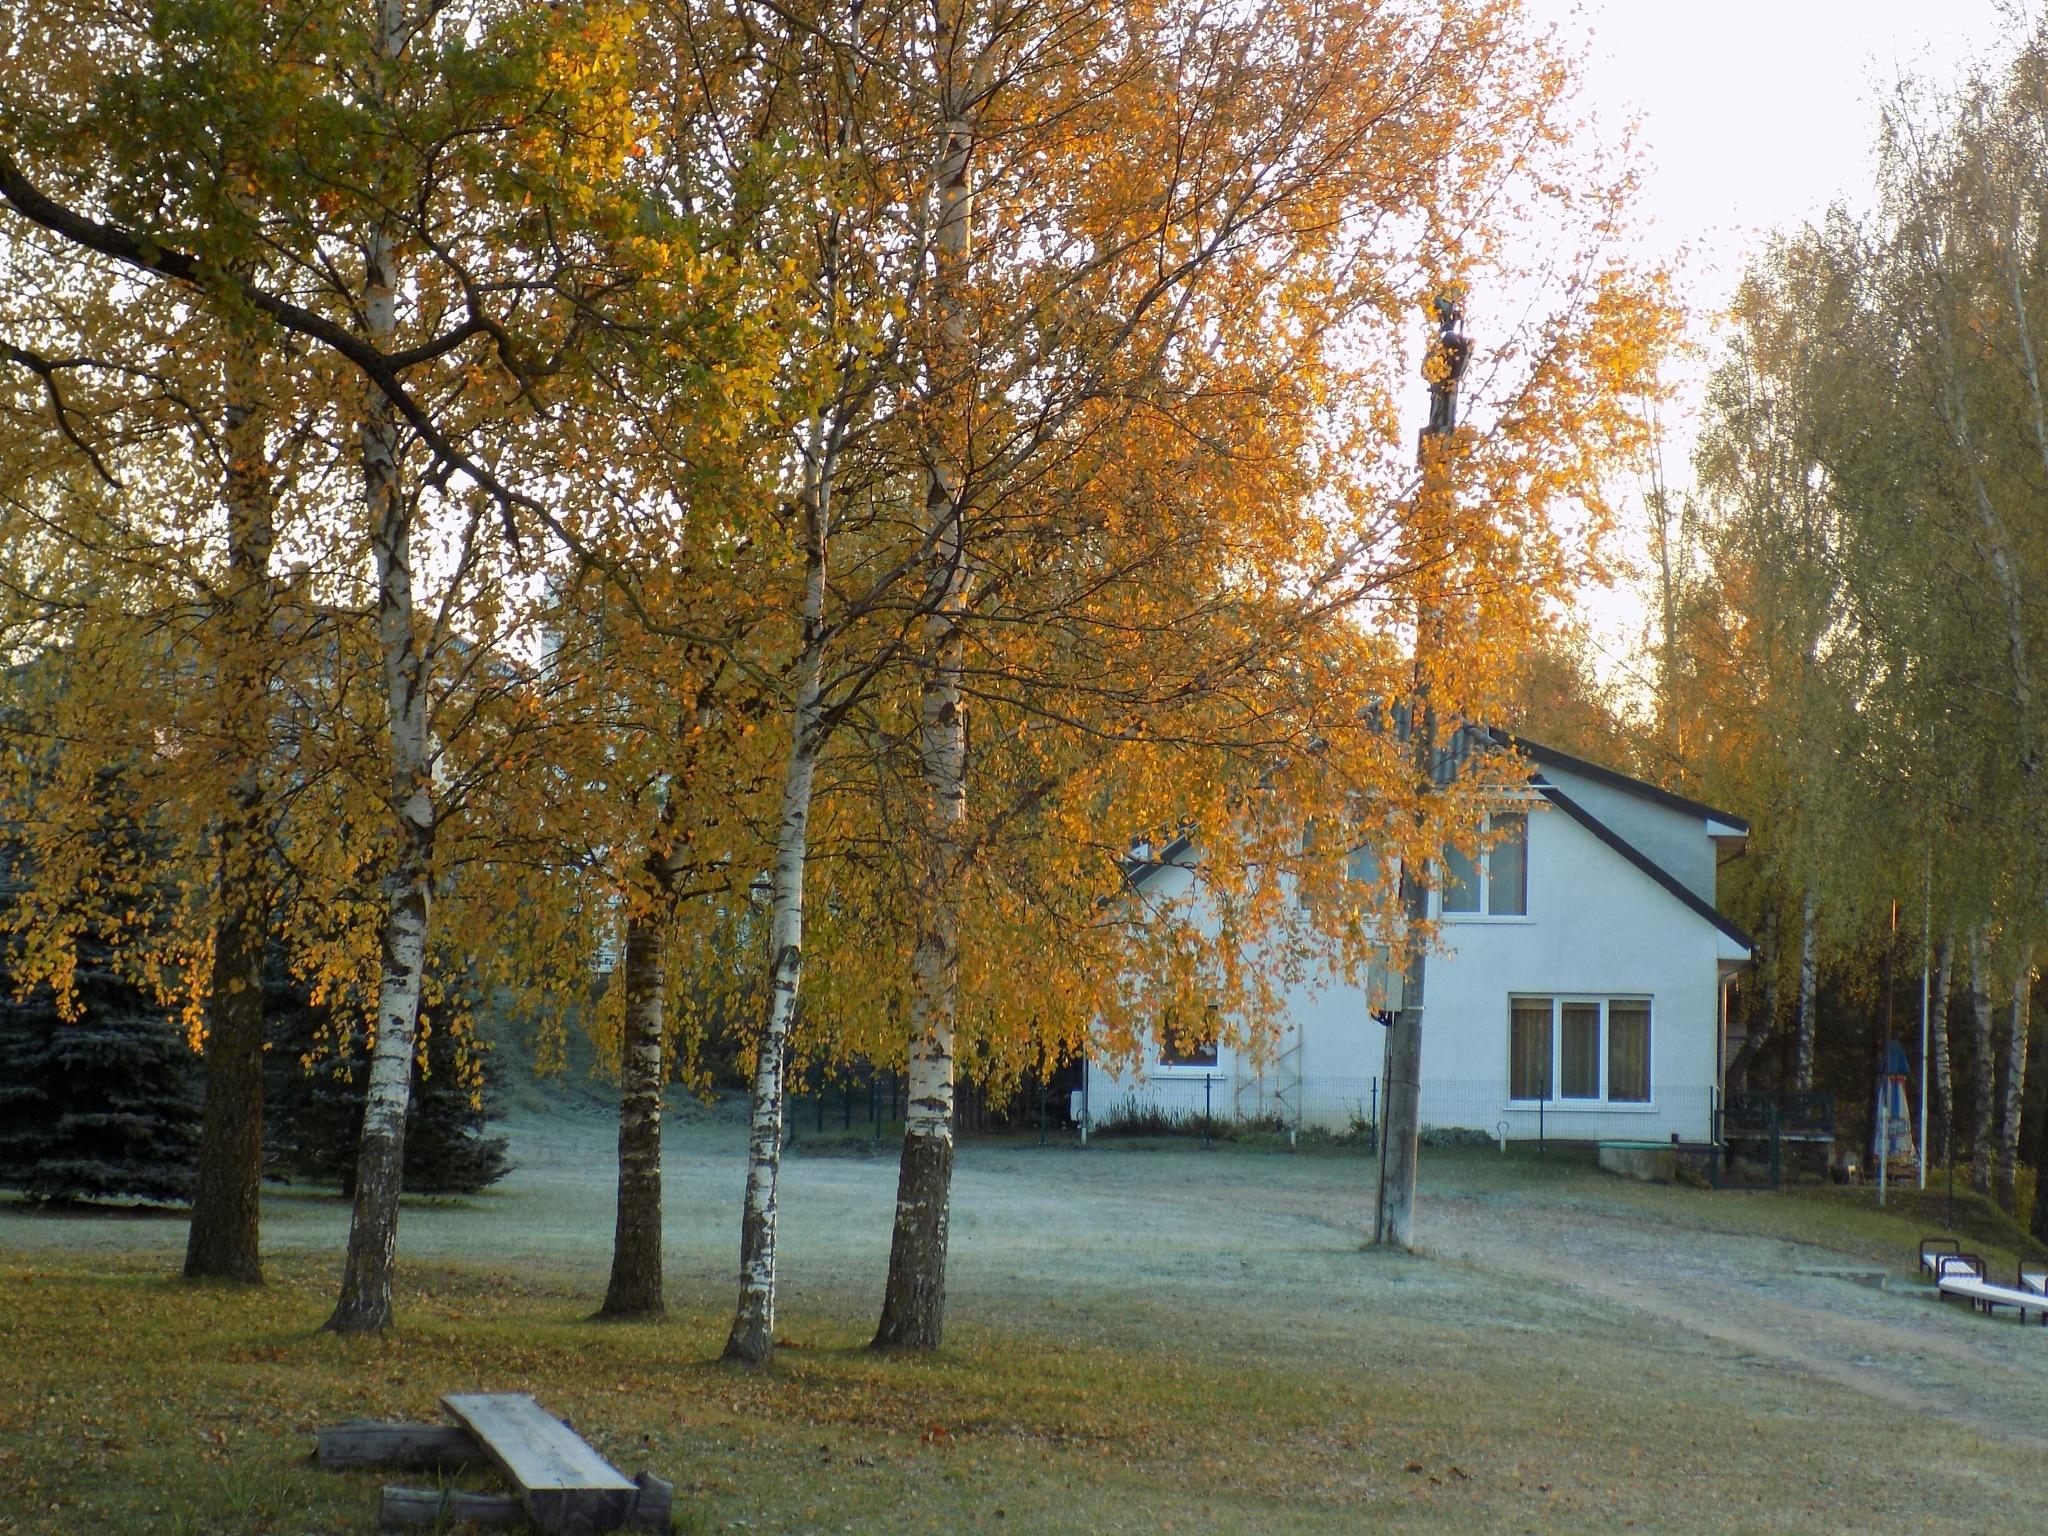 Autumn morning by uzkuraitiene62